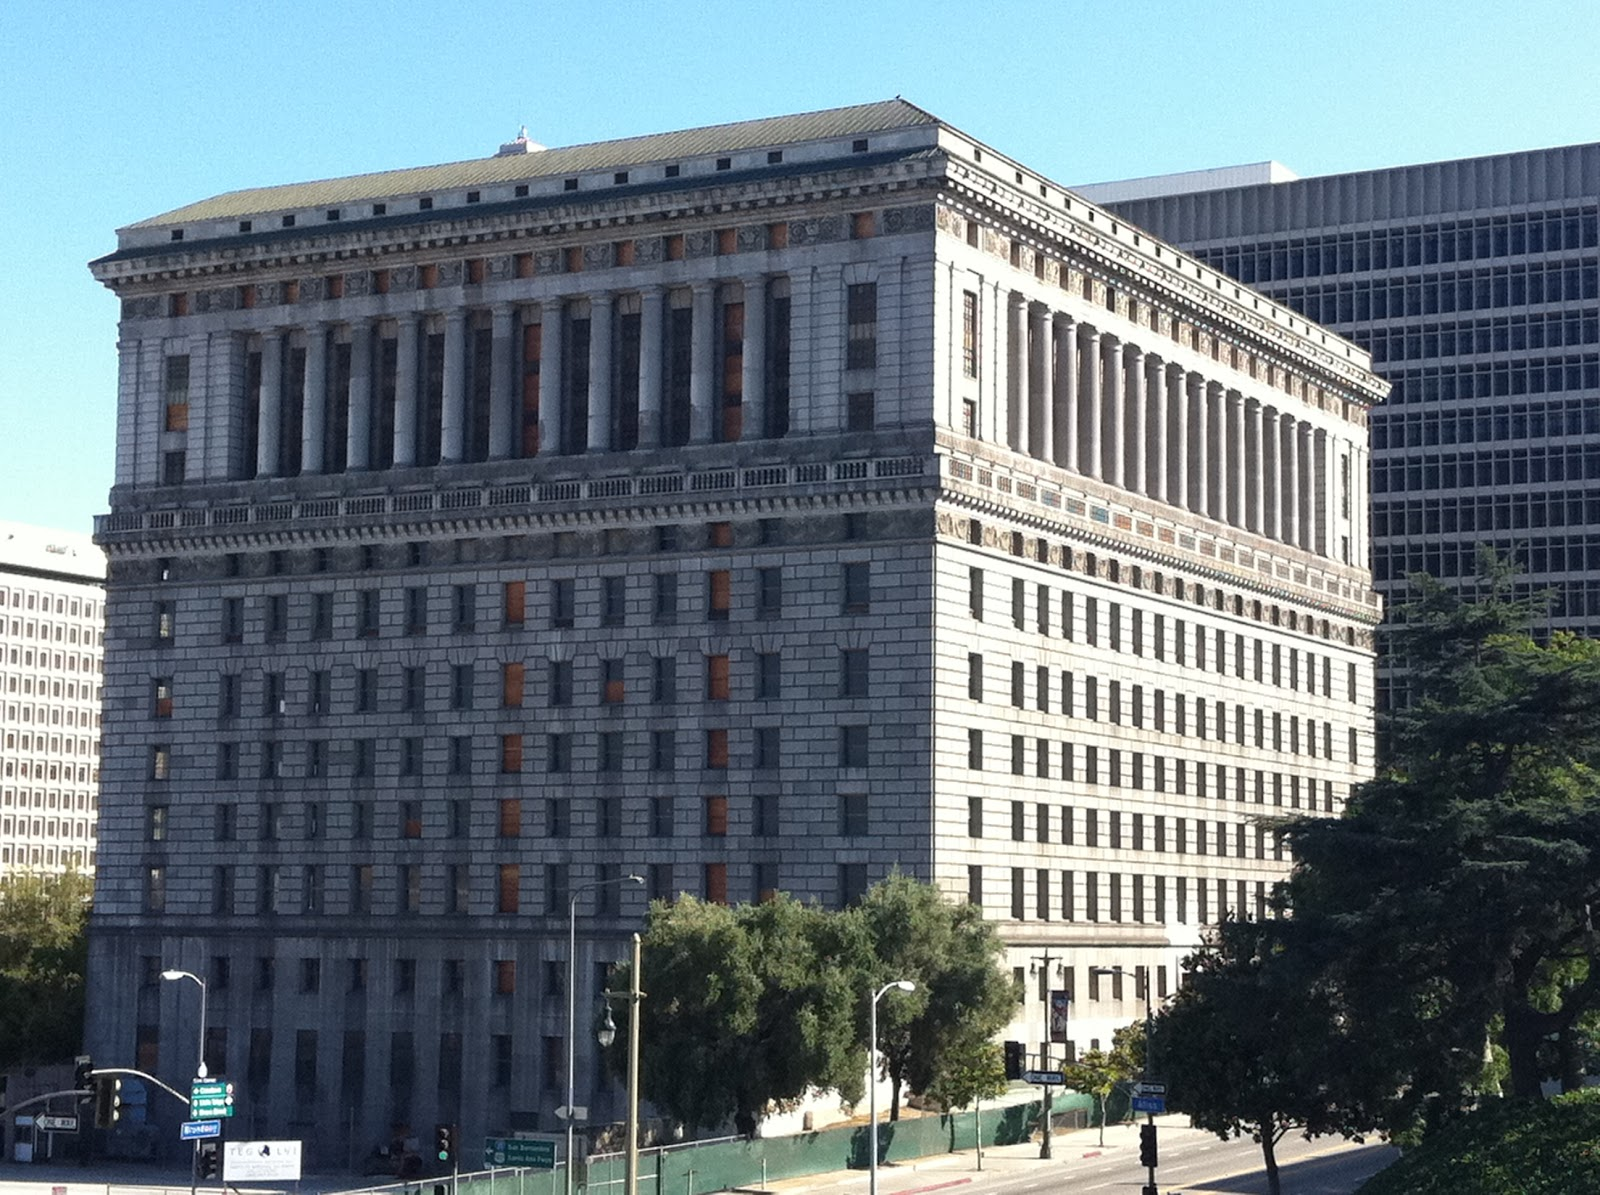 LA Hall of Justice